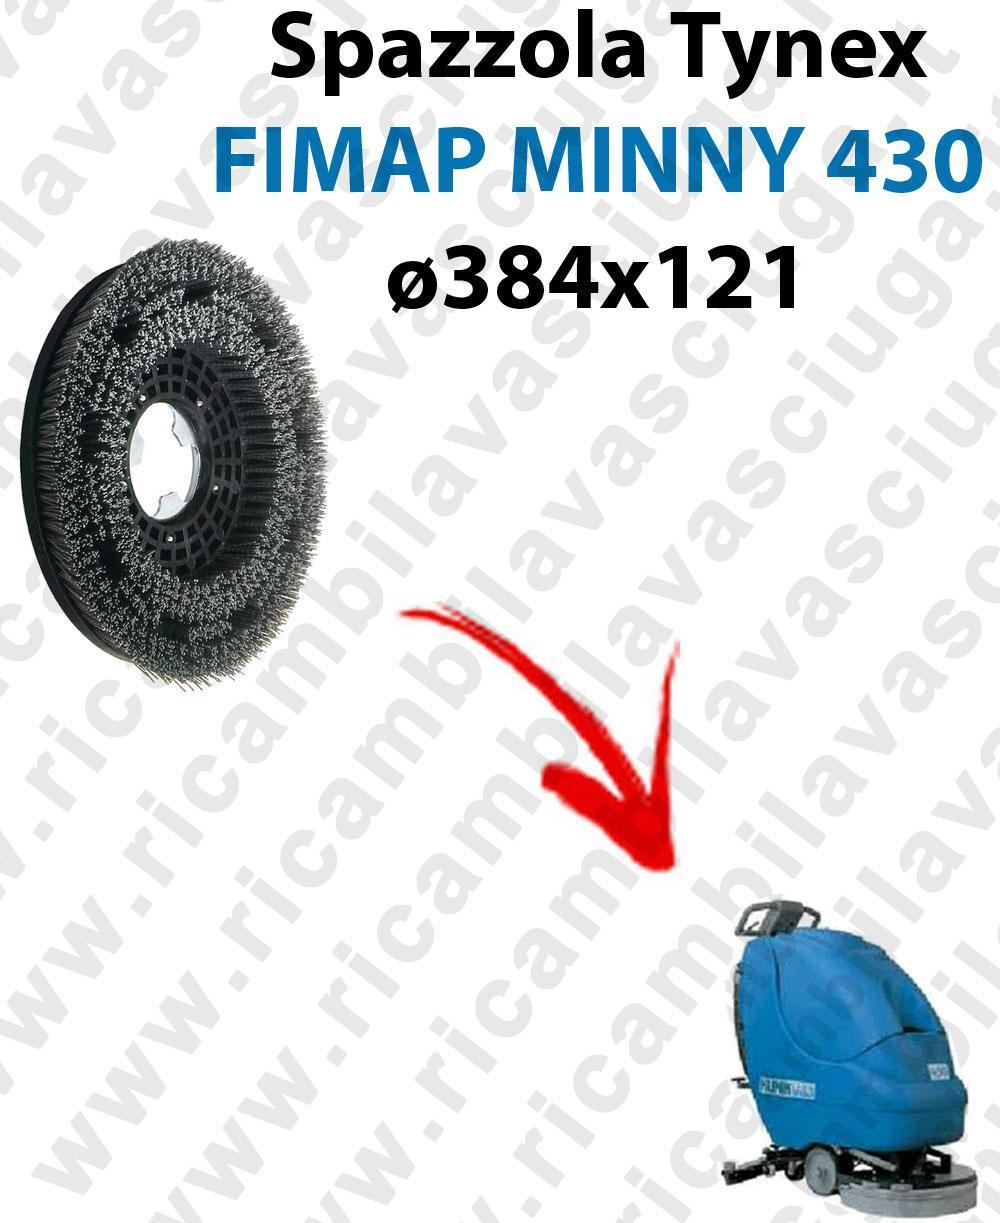 Cepillo TYNEX  para fregadora FIMAP MINNY 430. modelo: tynex  ø 384 X 121